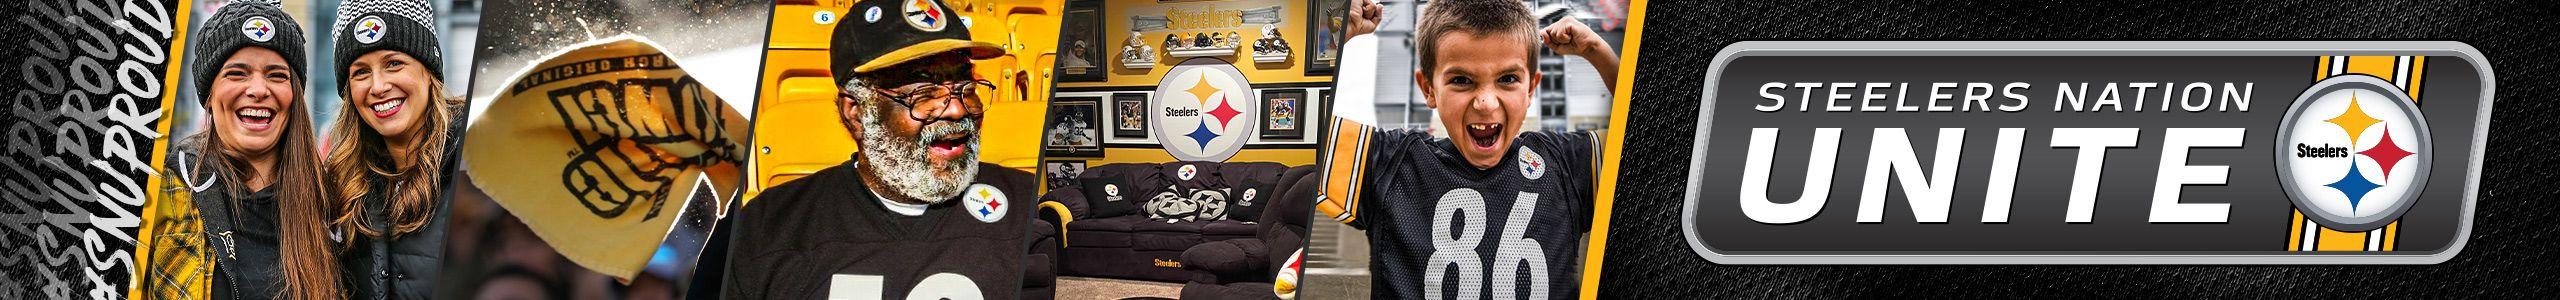 SNU_Steelers.com_Homepage_Banner_Show_v2